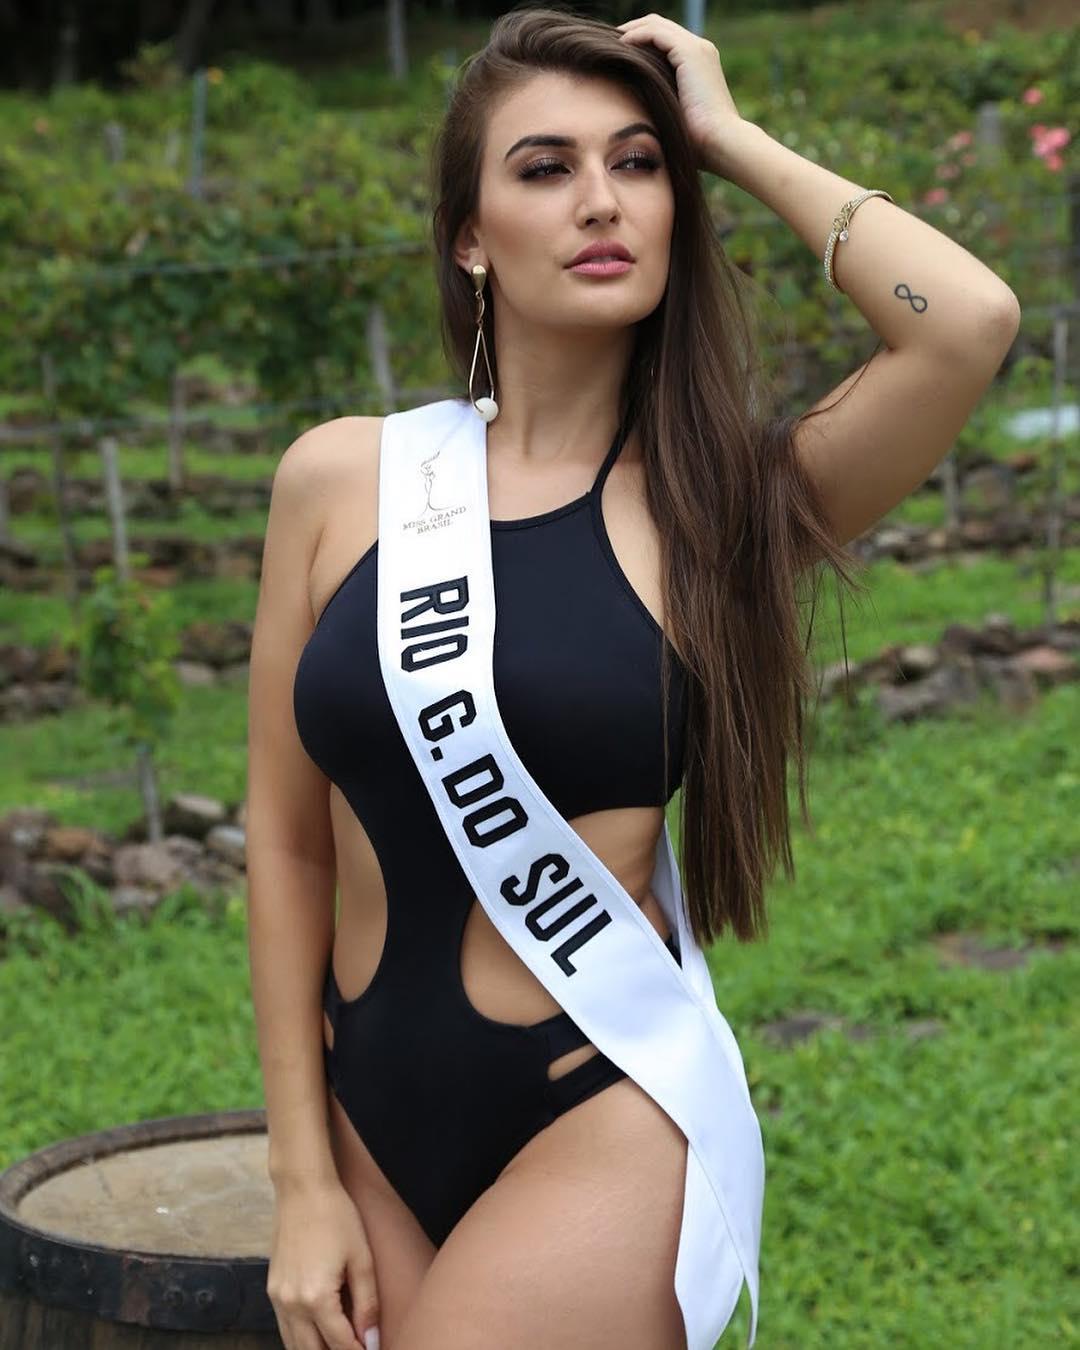 sao paulo vence miss grand brasil 2019. - Página 2 Trzmpy26